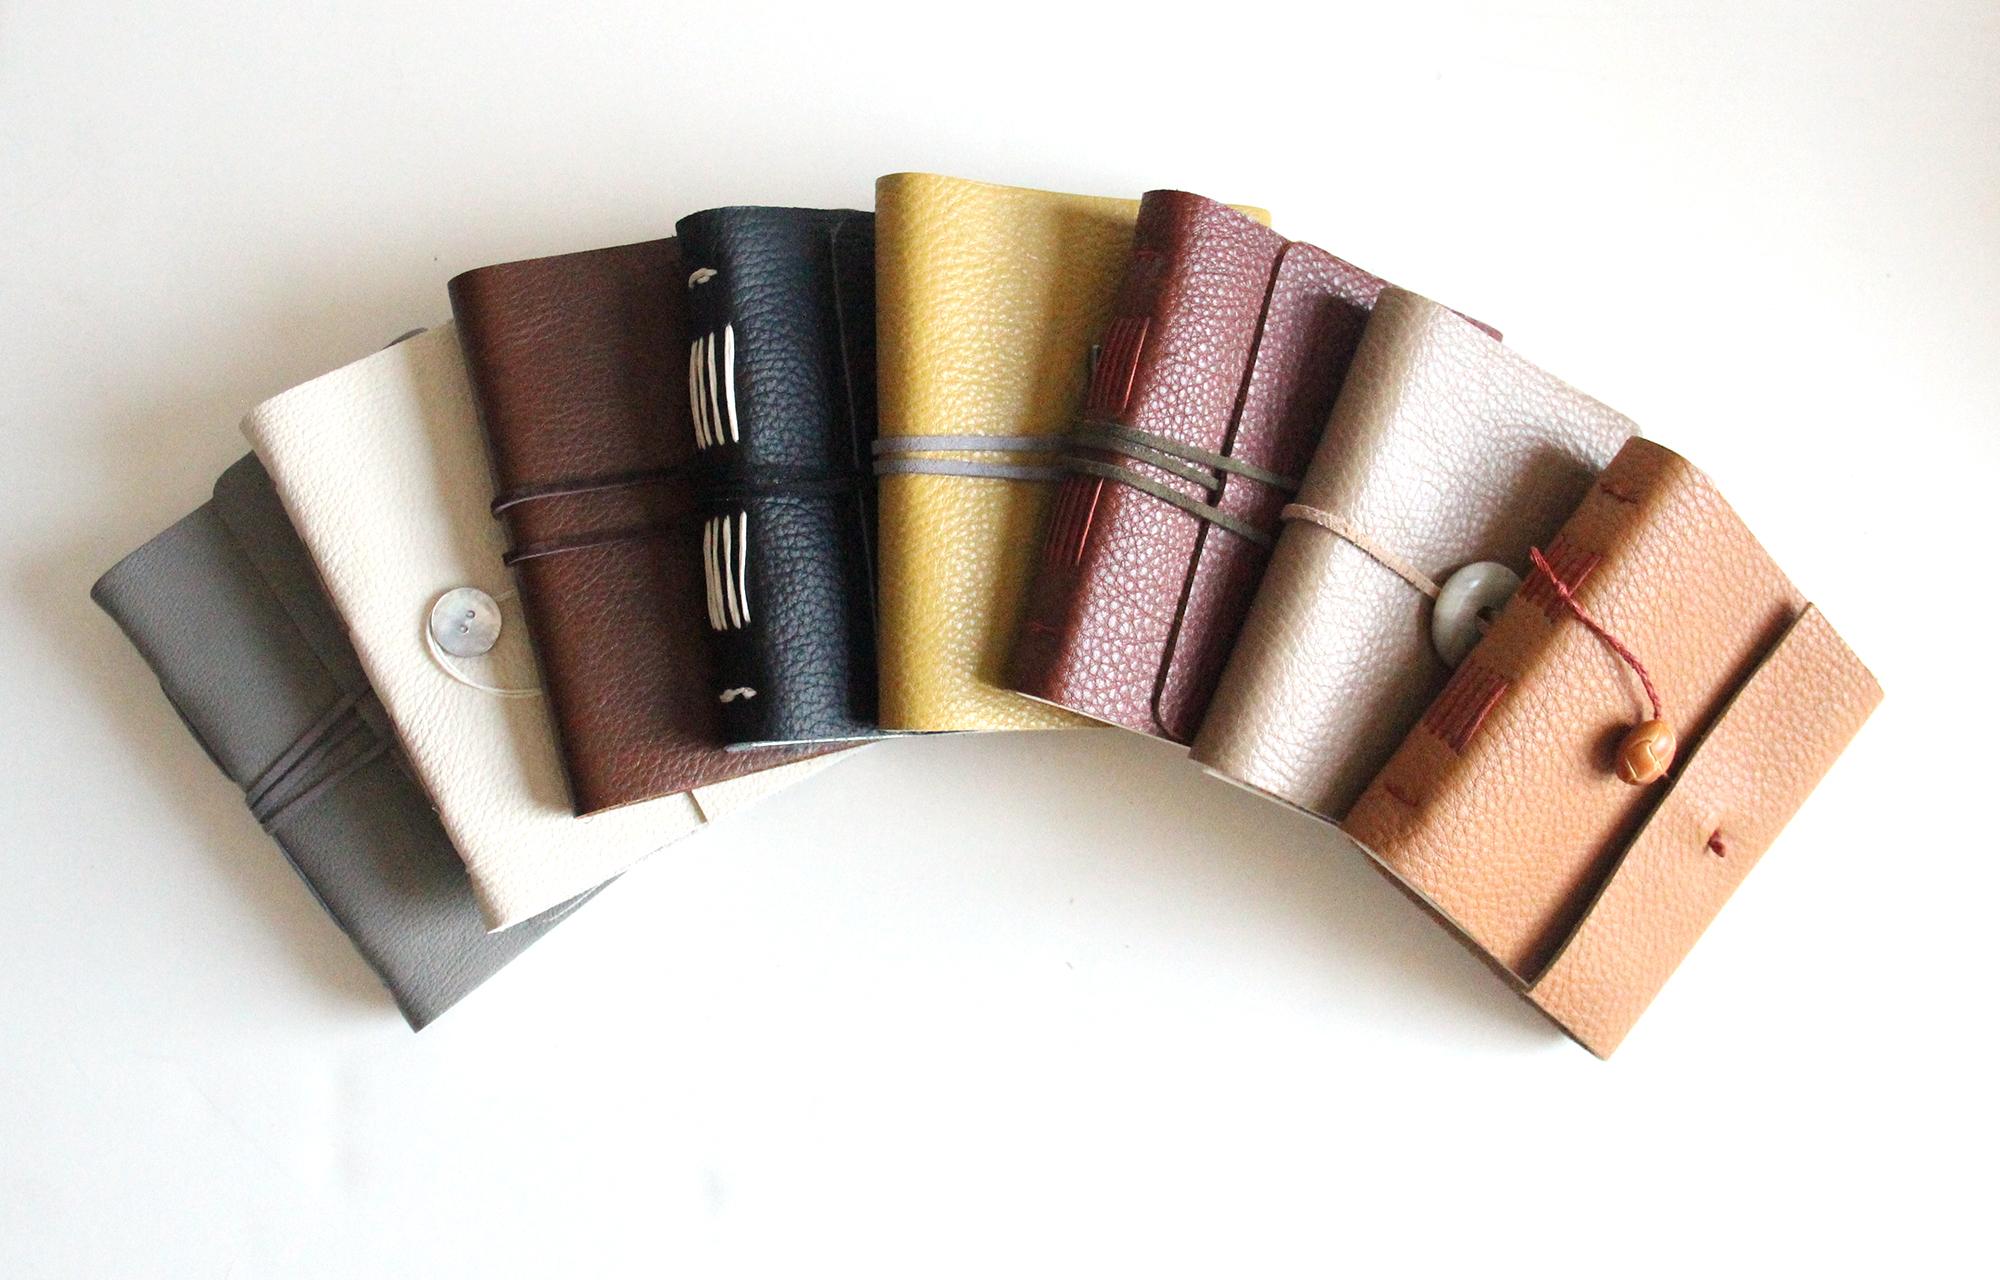 leatherjournals2017_d.jpg